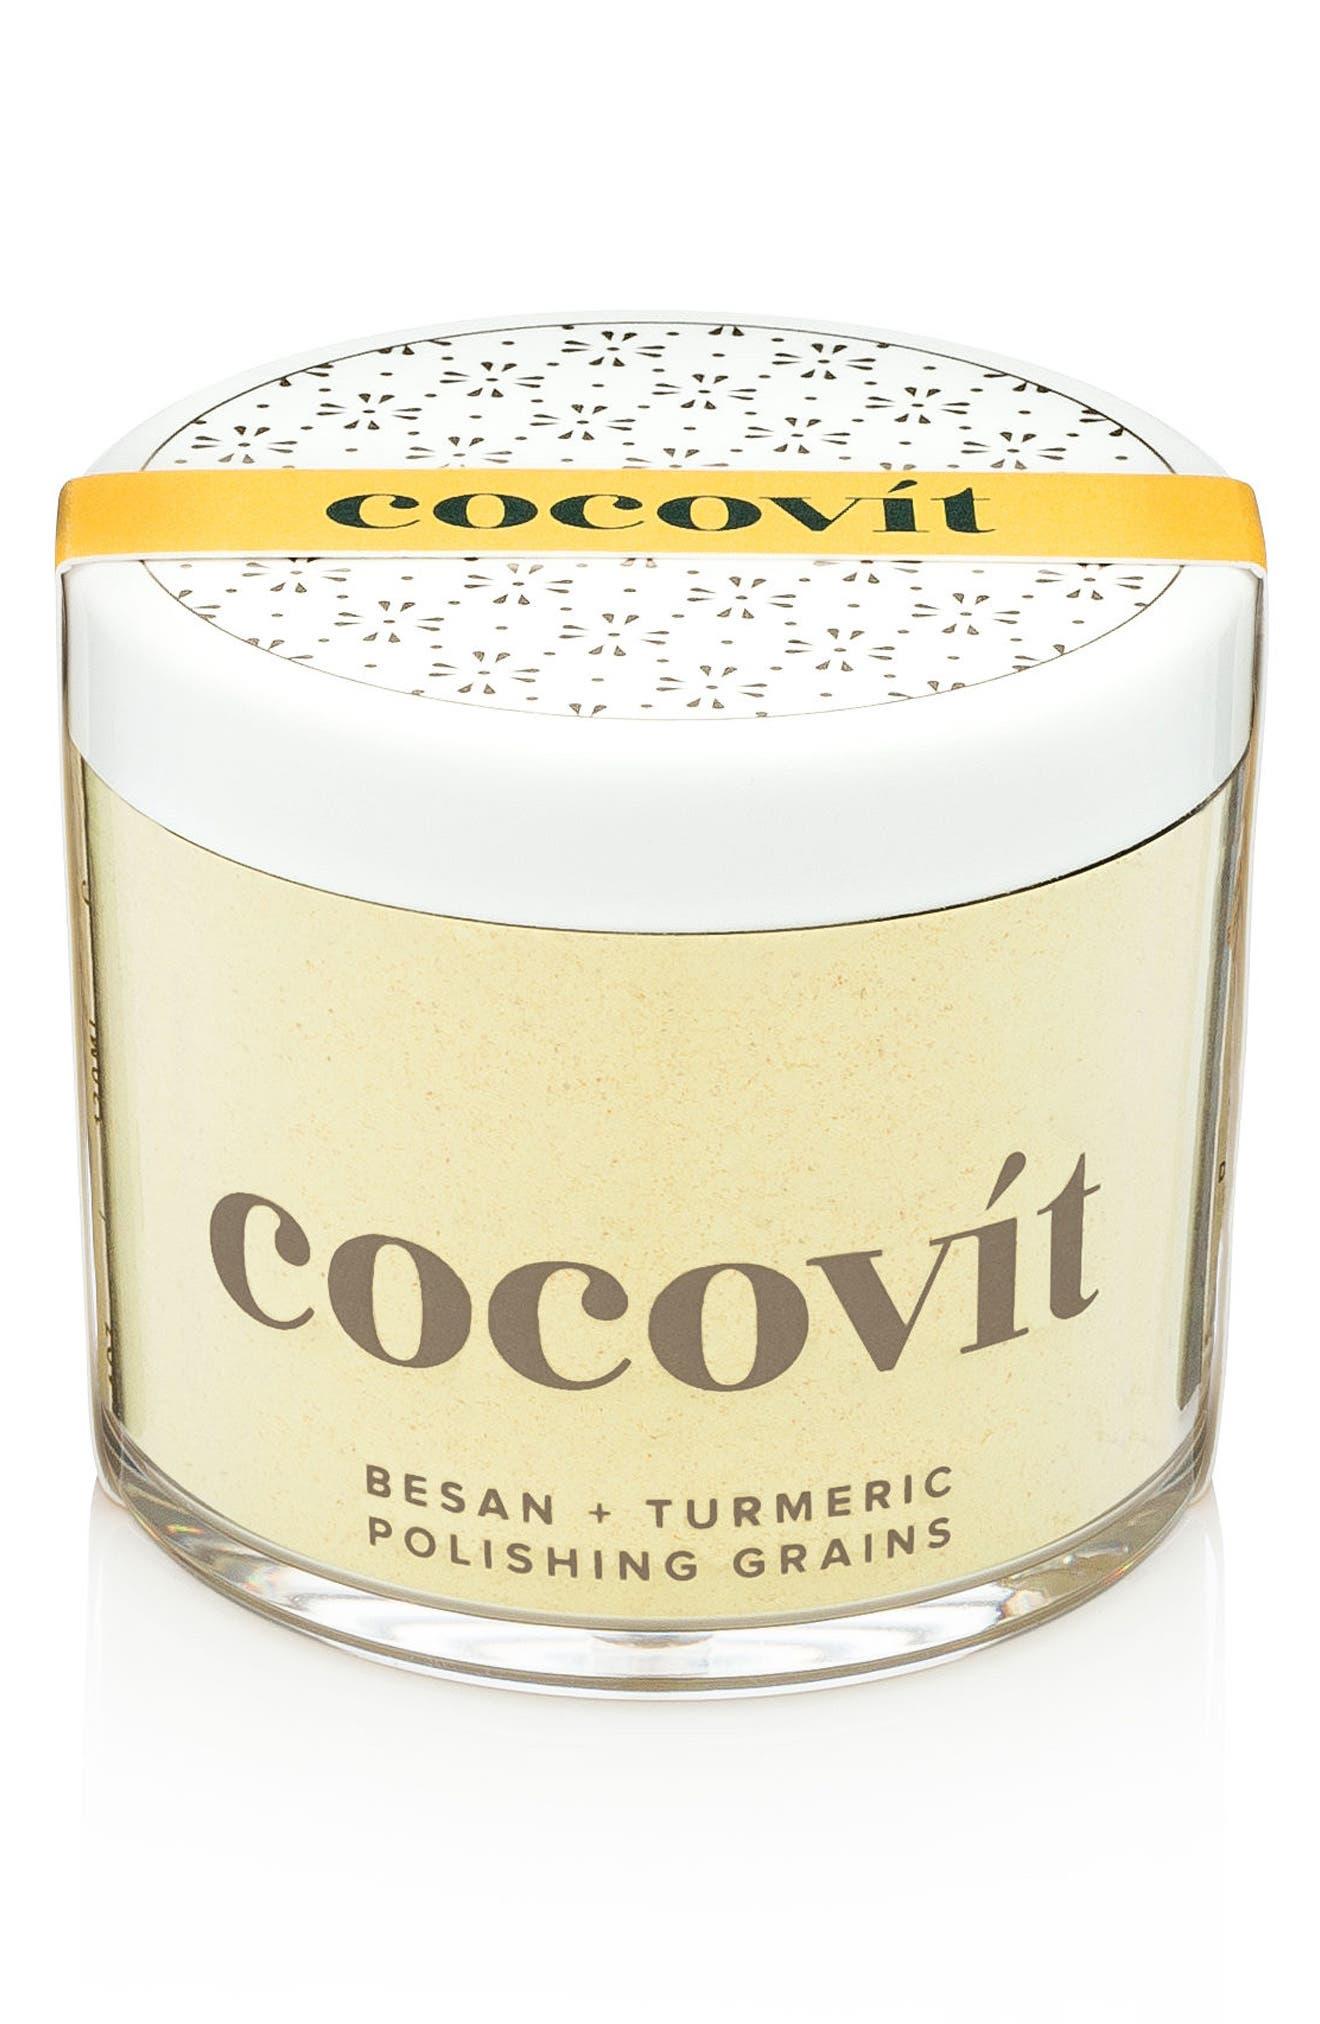 Cocovit Besan + Turmeric Polishing Grains